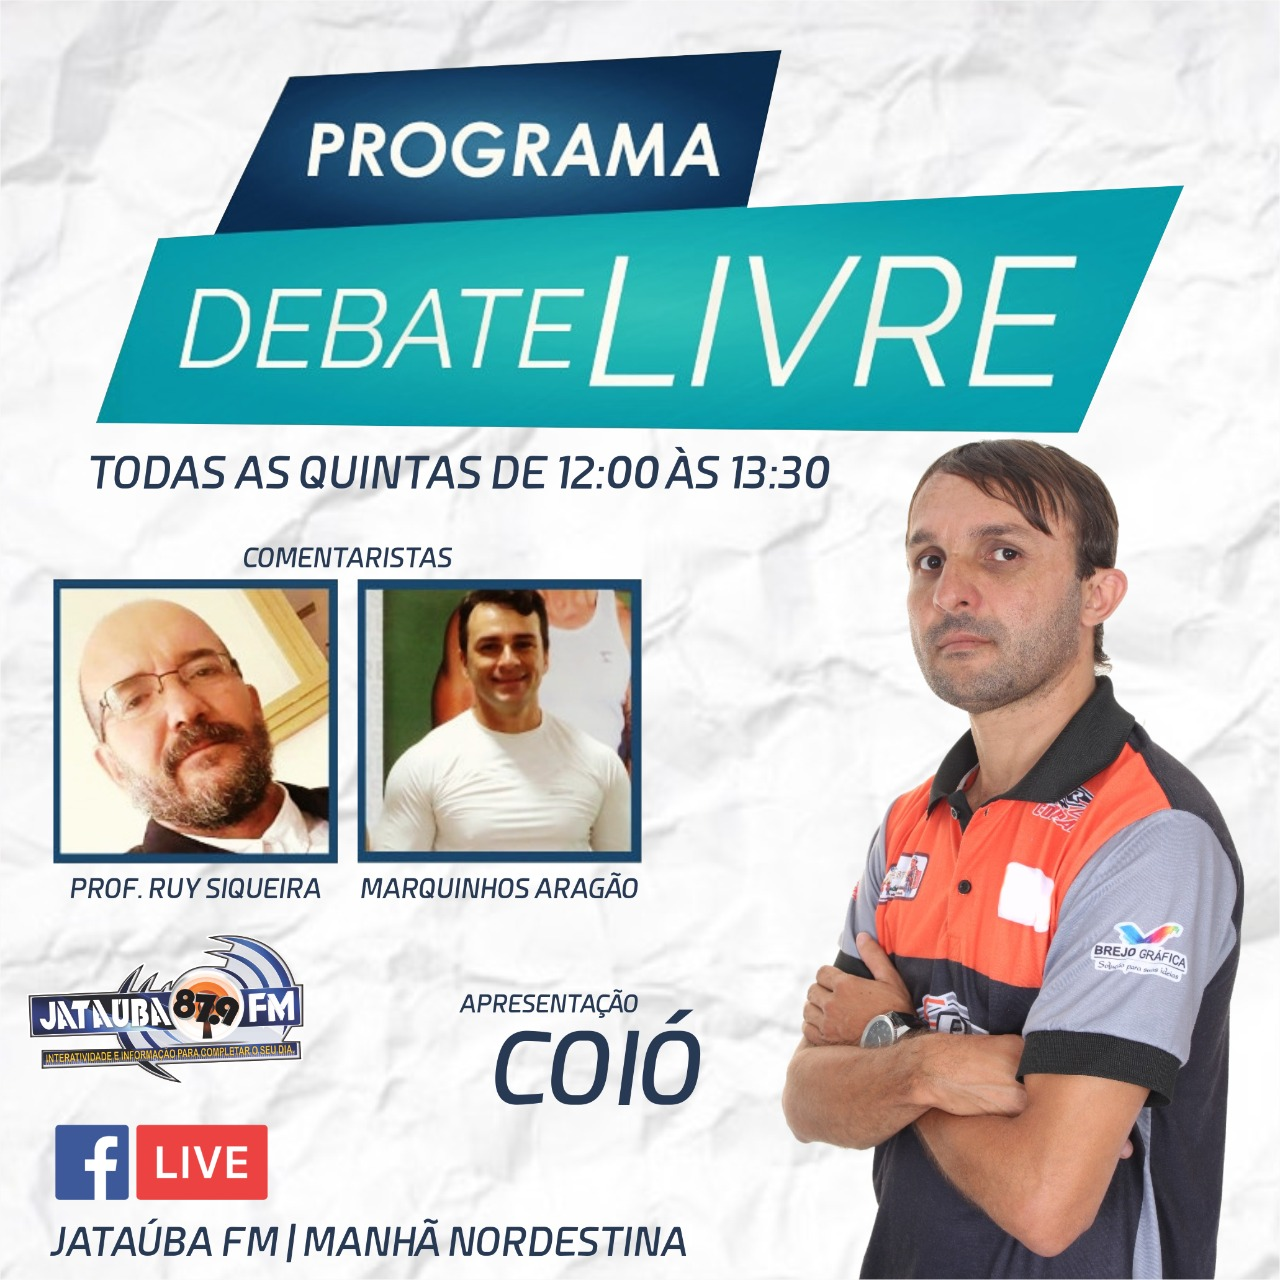 Programa Debate Livre